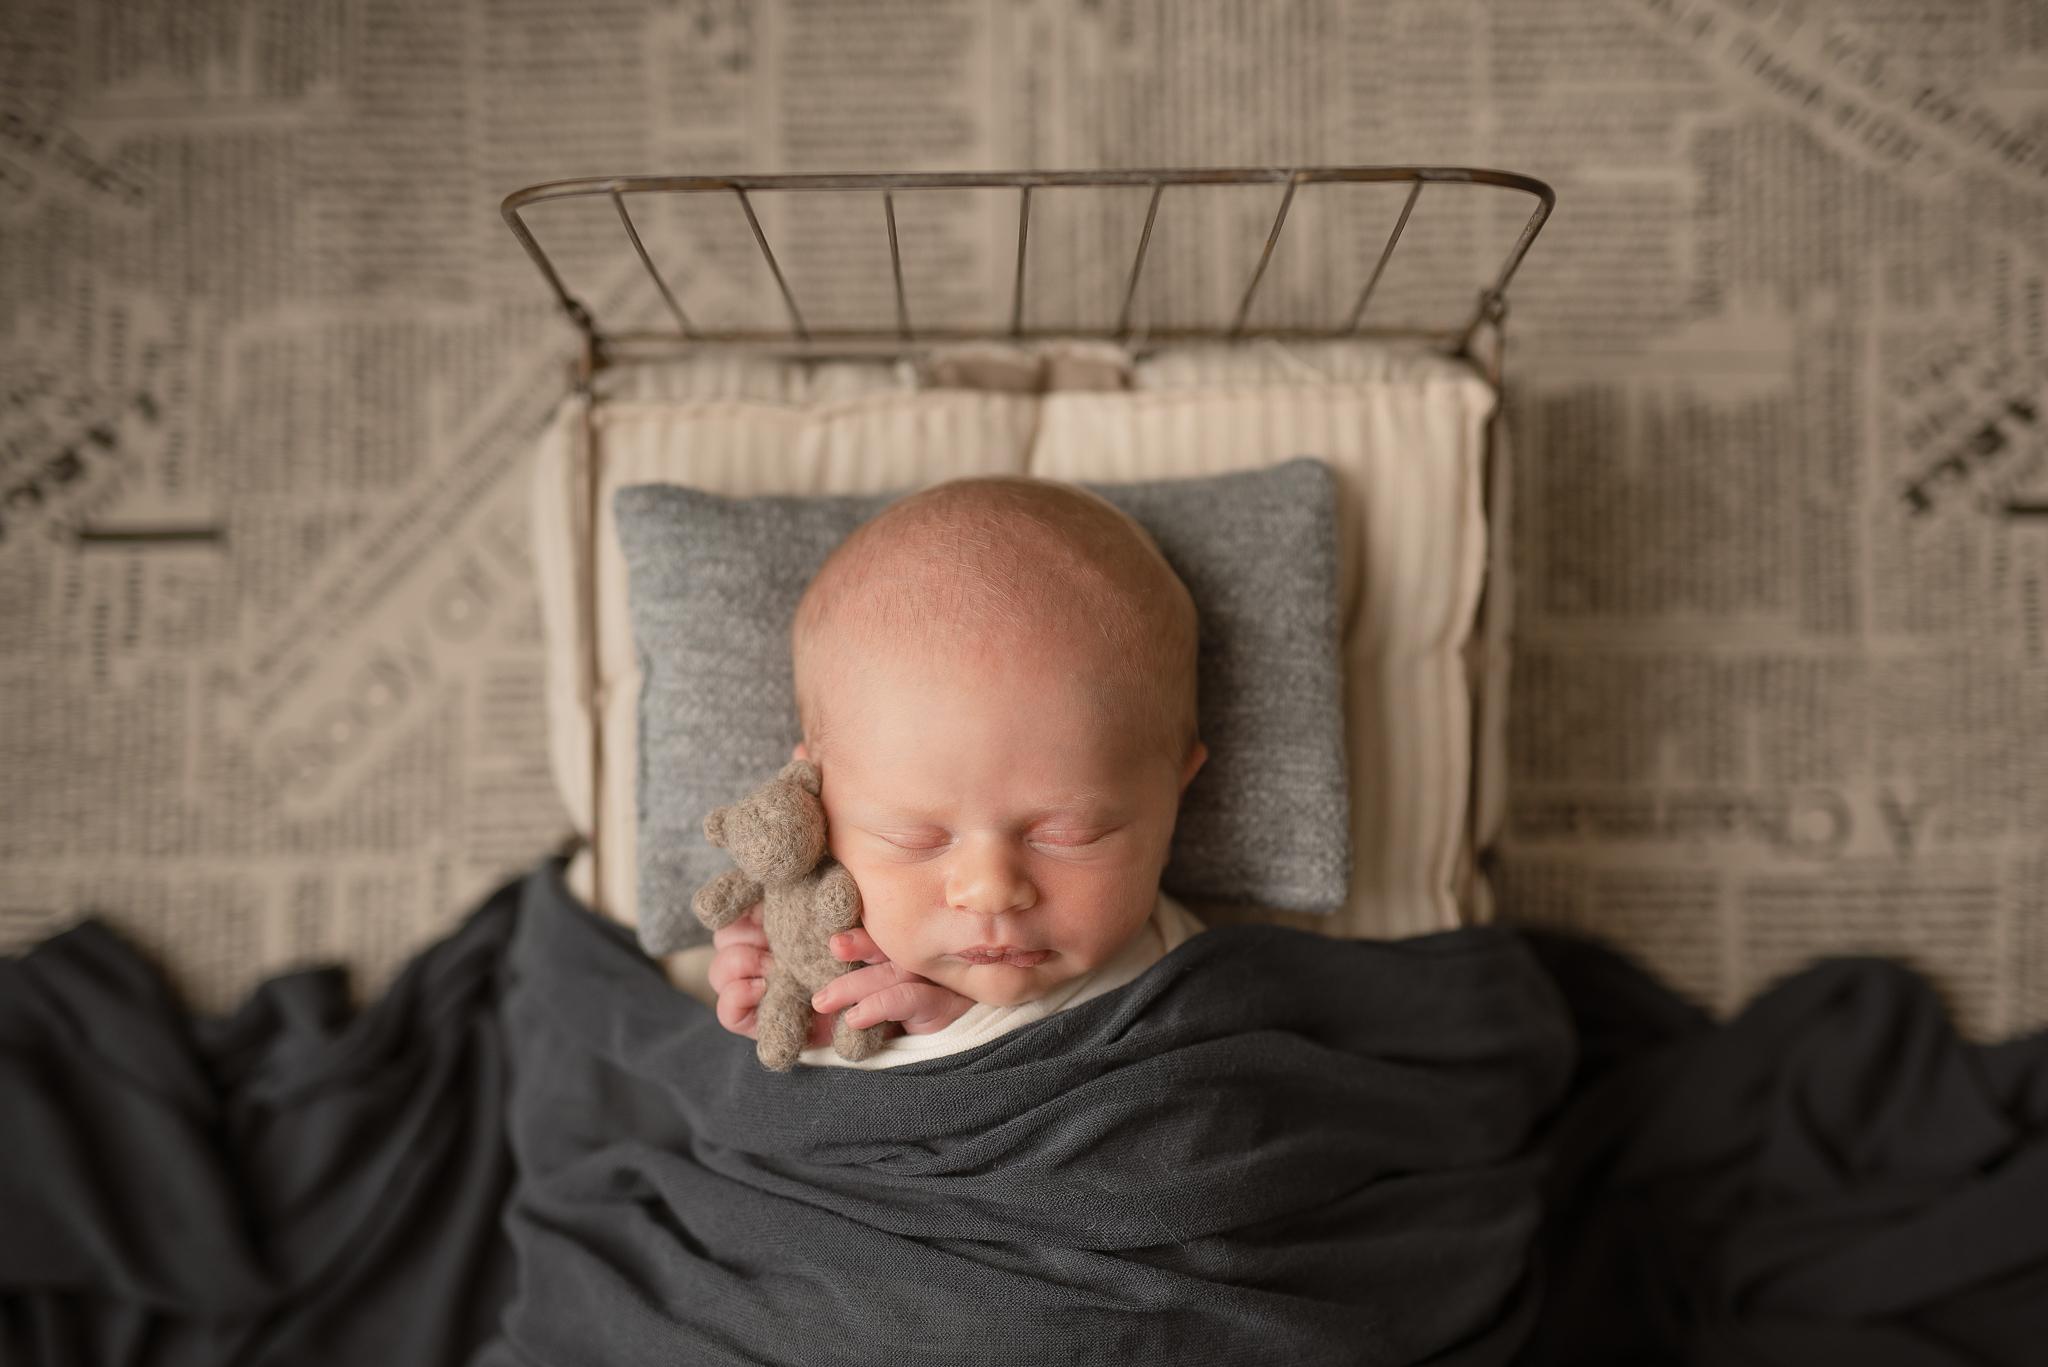 Newborn383NaomiLuciennePhotography062019-Edit.jpg